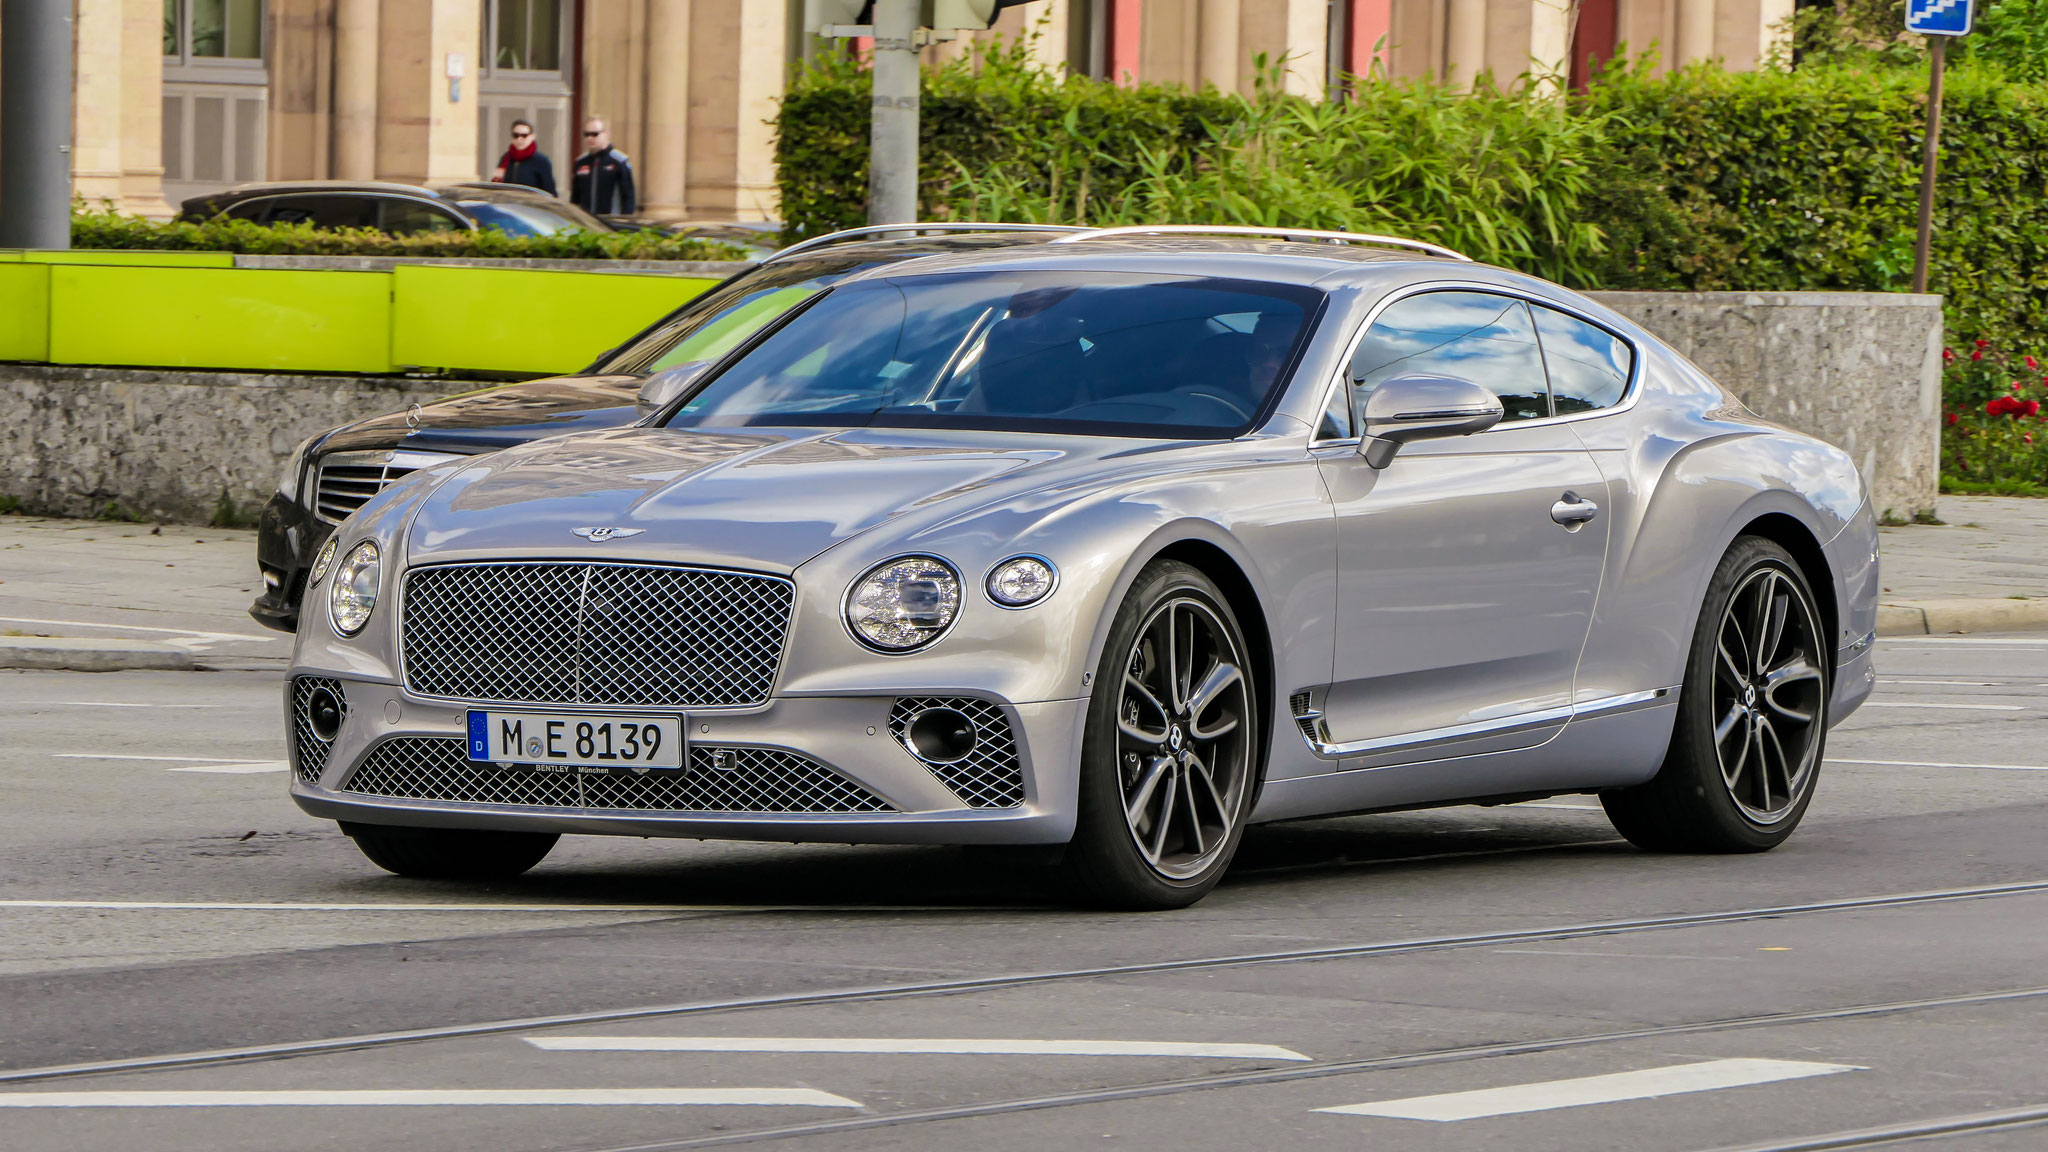 Bentley Continental GT - M-E-8139